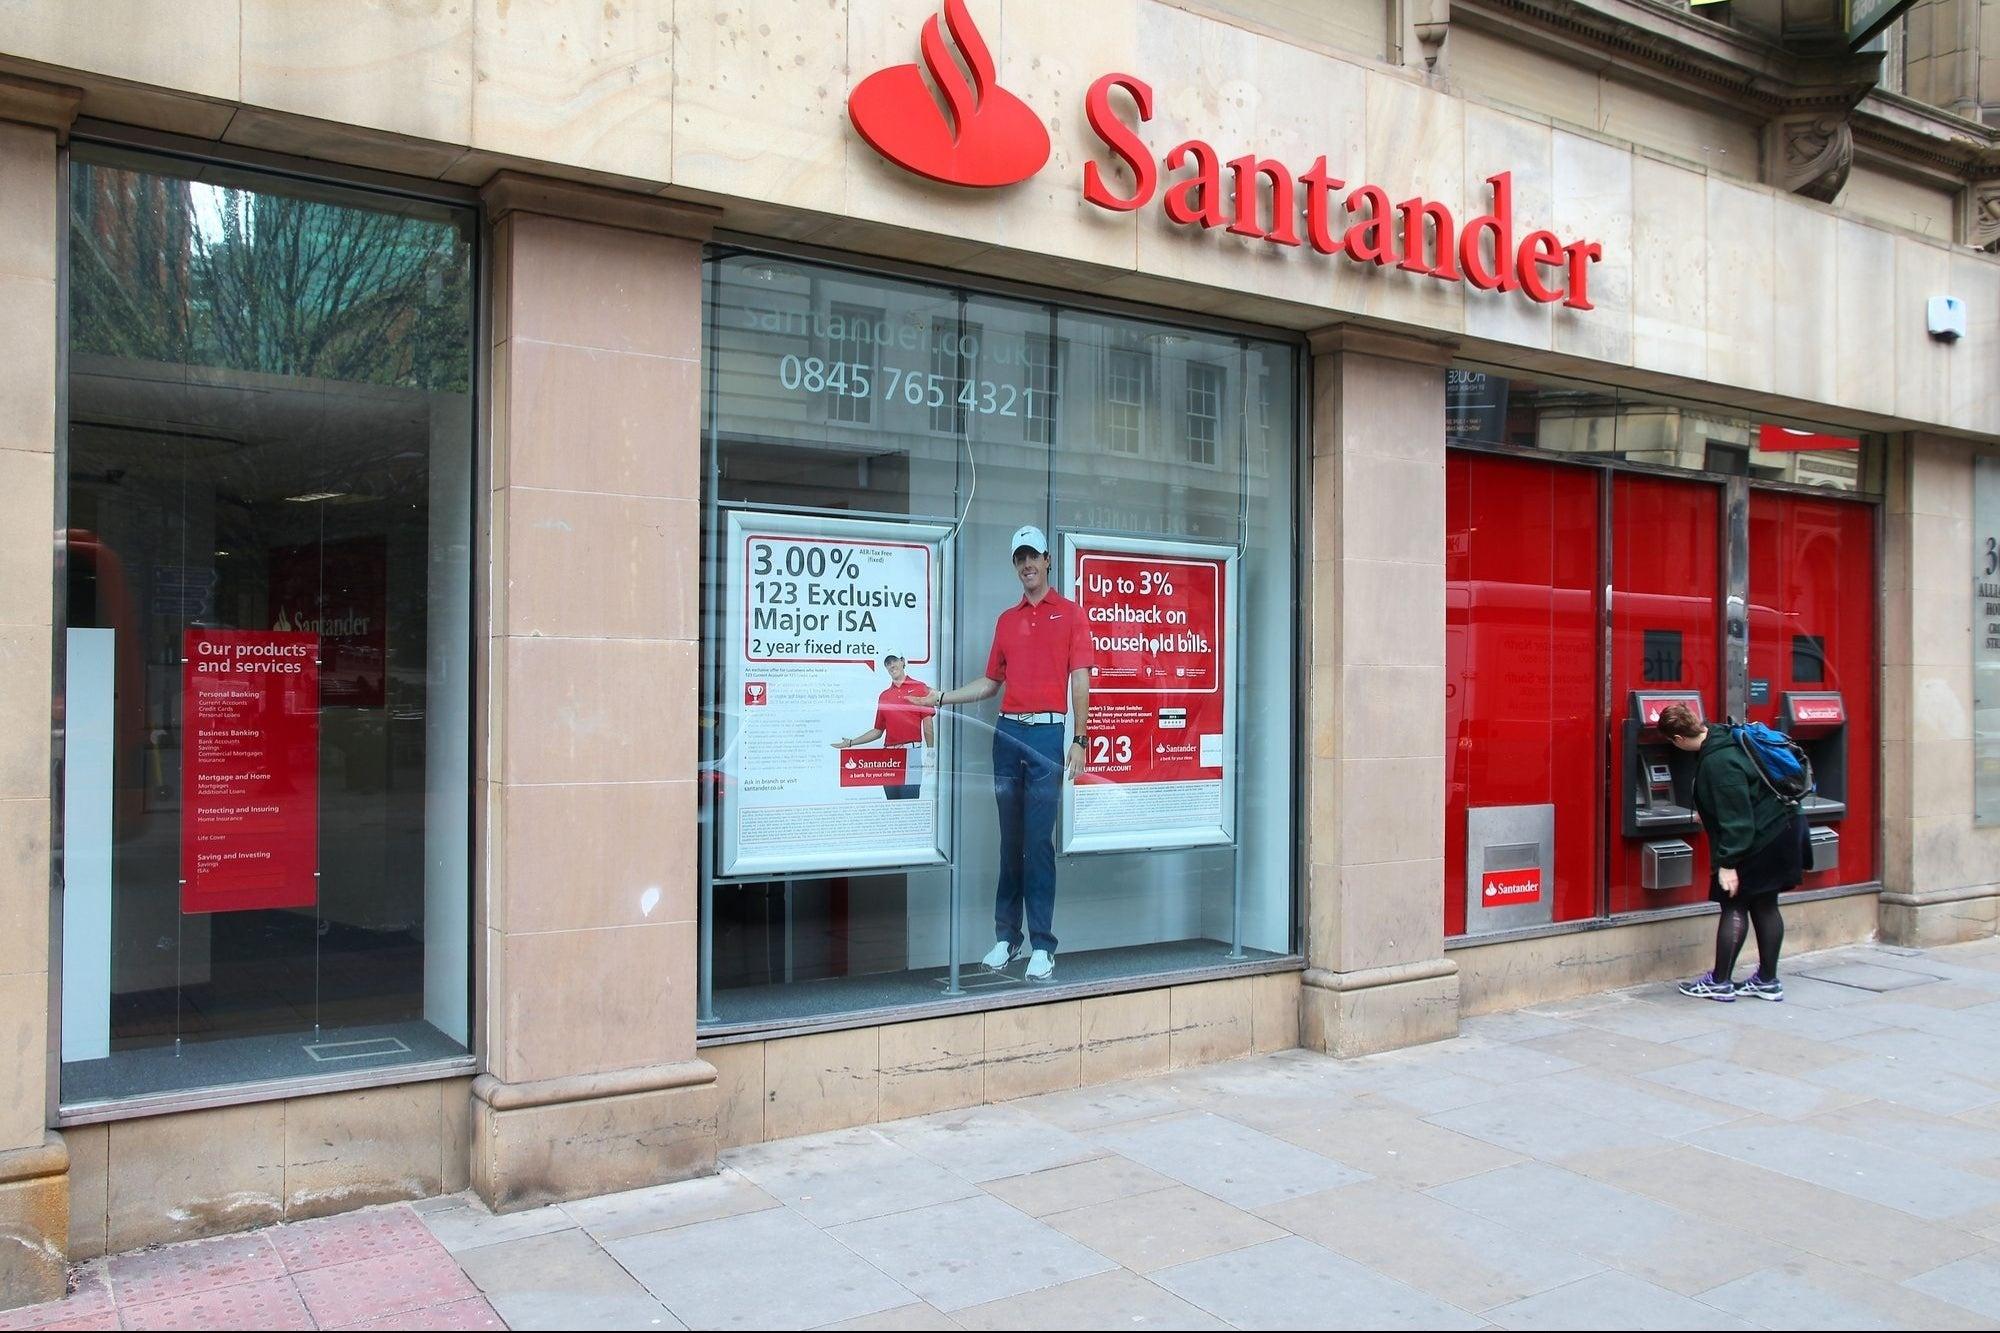 Min Side Santander